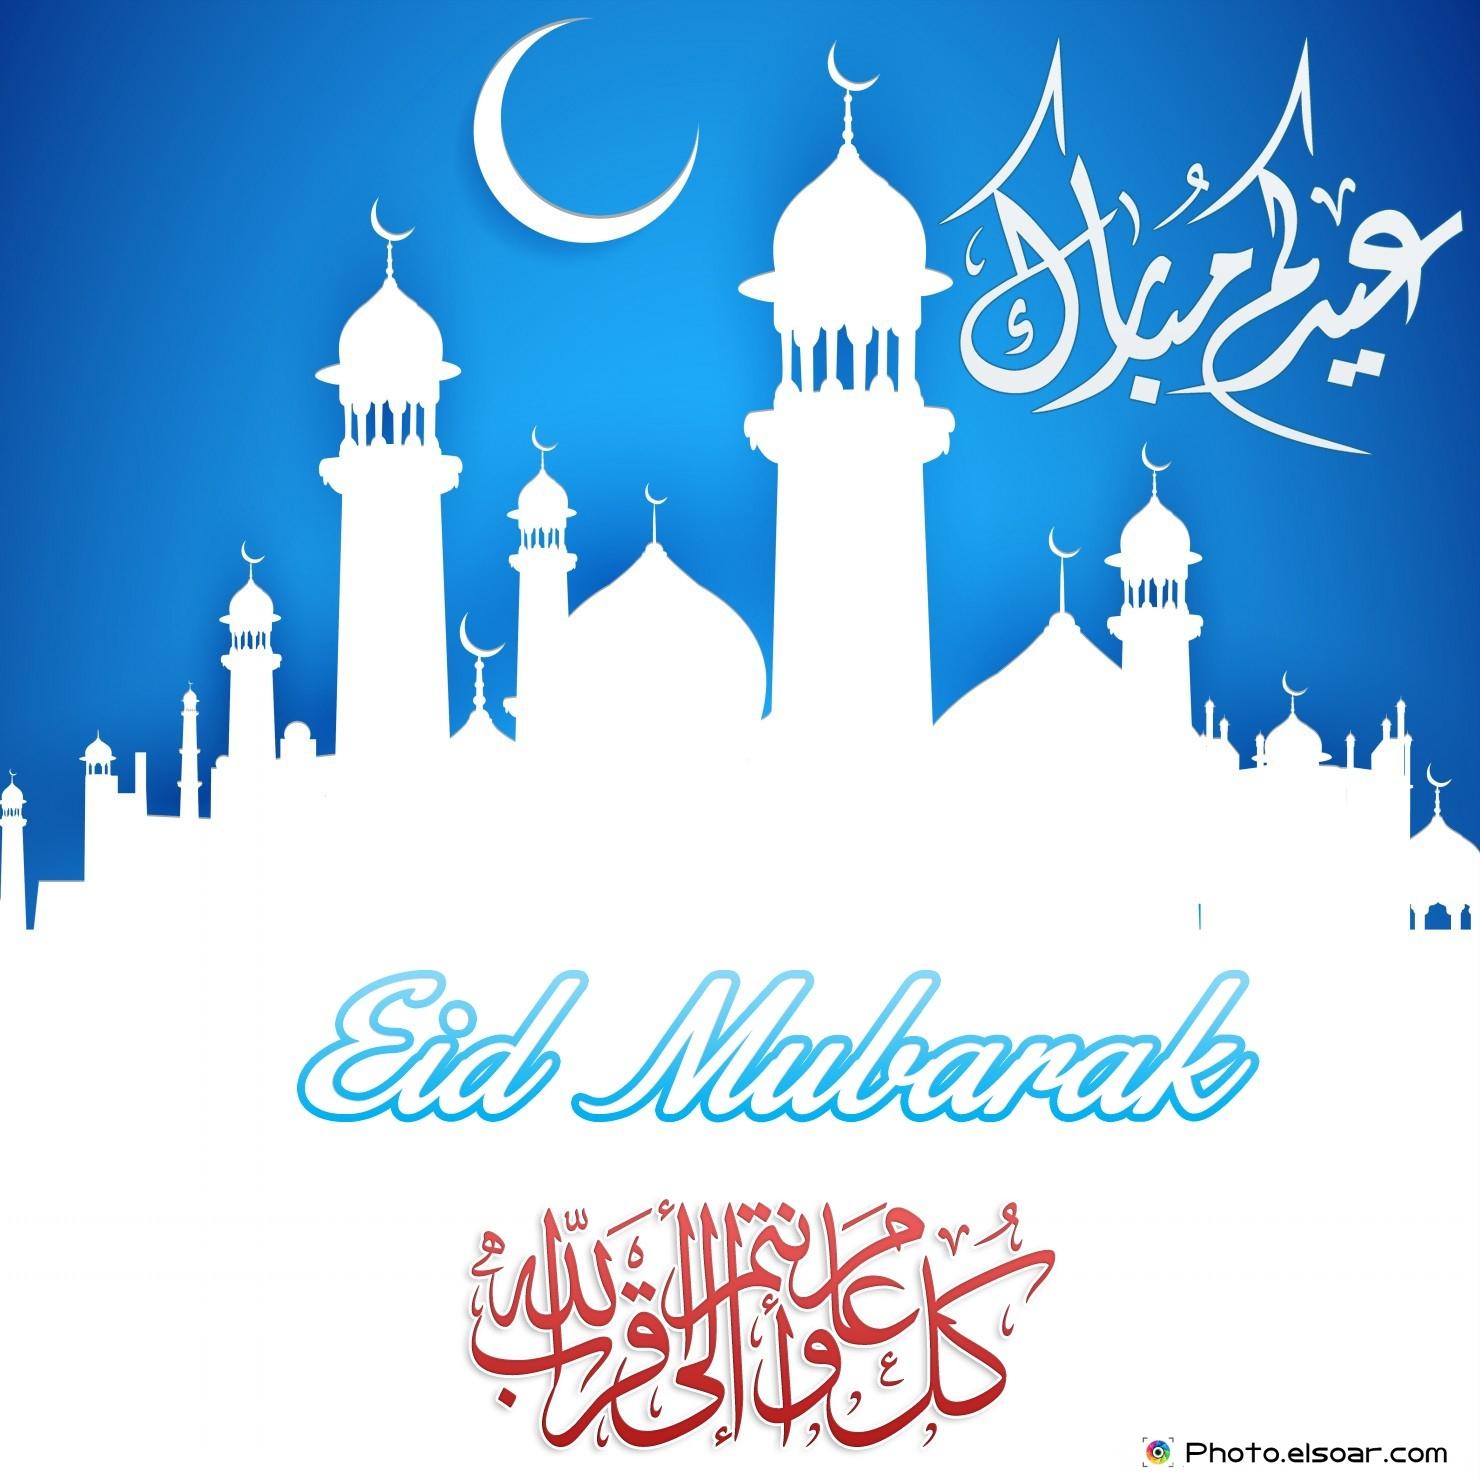 Hd wallpaper eid mubarak - Eid Mubarak Hd Wallpaper With Mosque